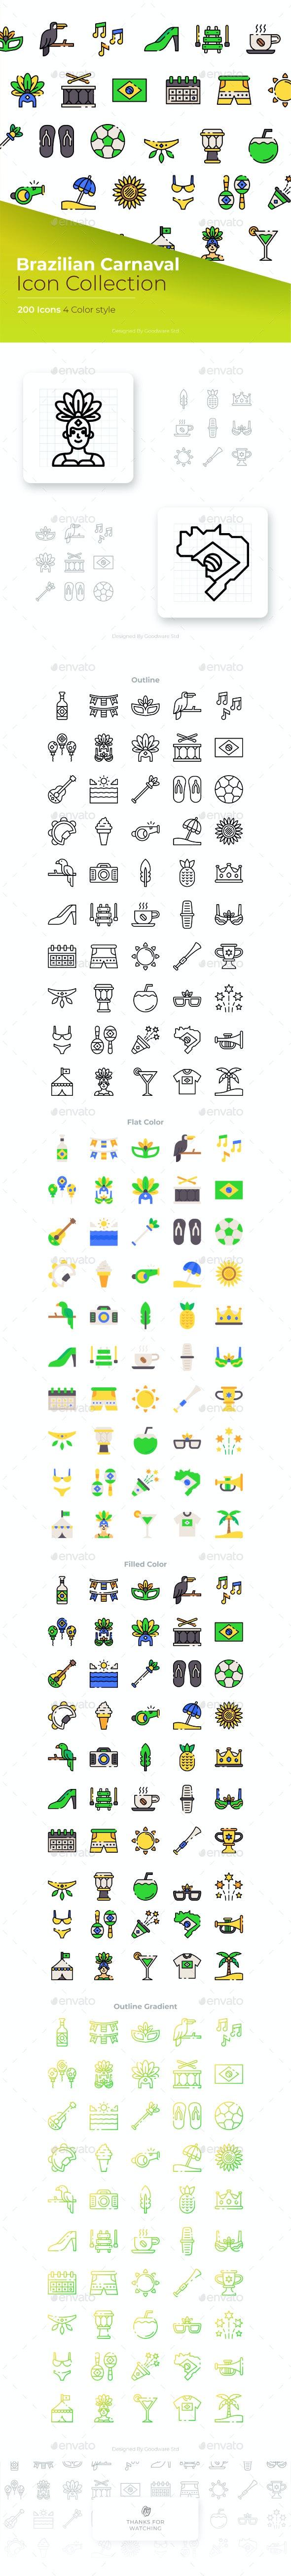 Brazilian Carnival Icon - Seasonal Icons